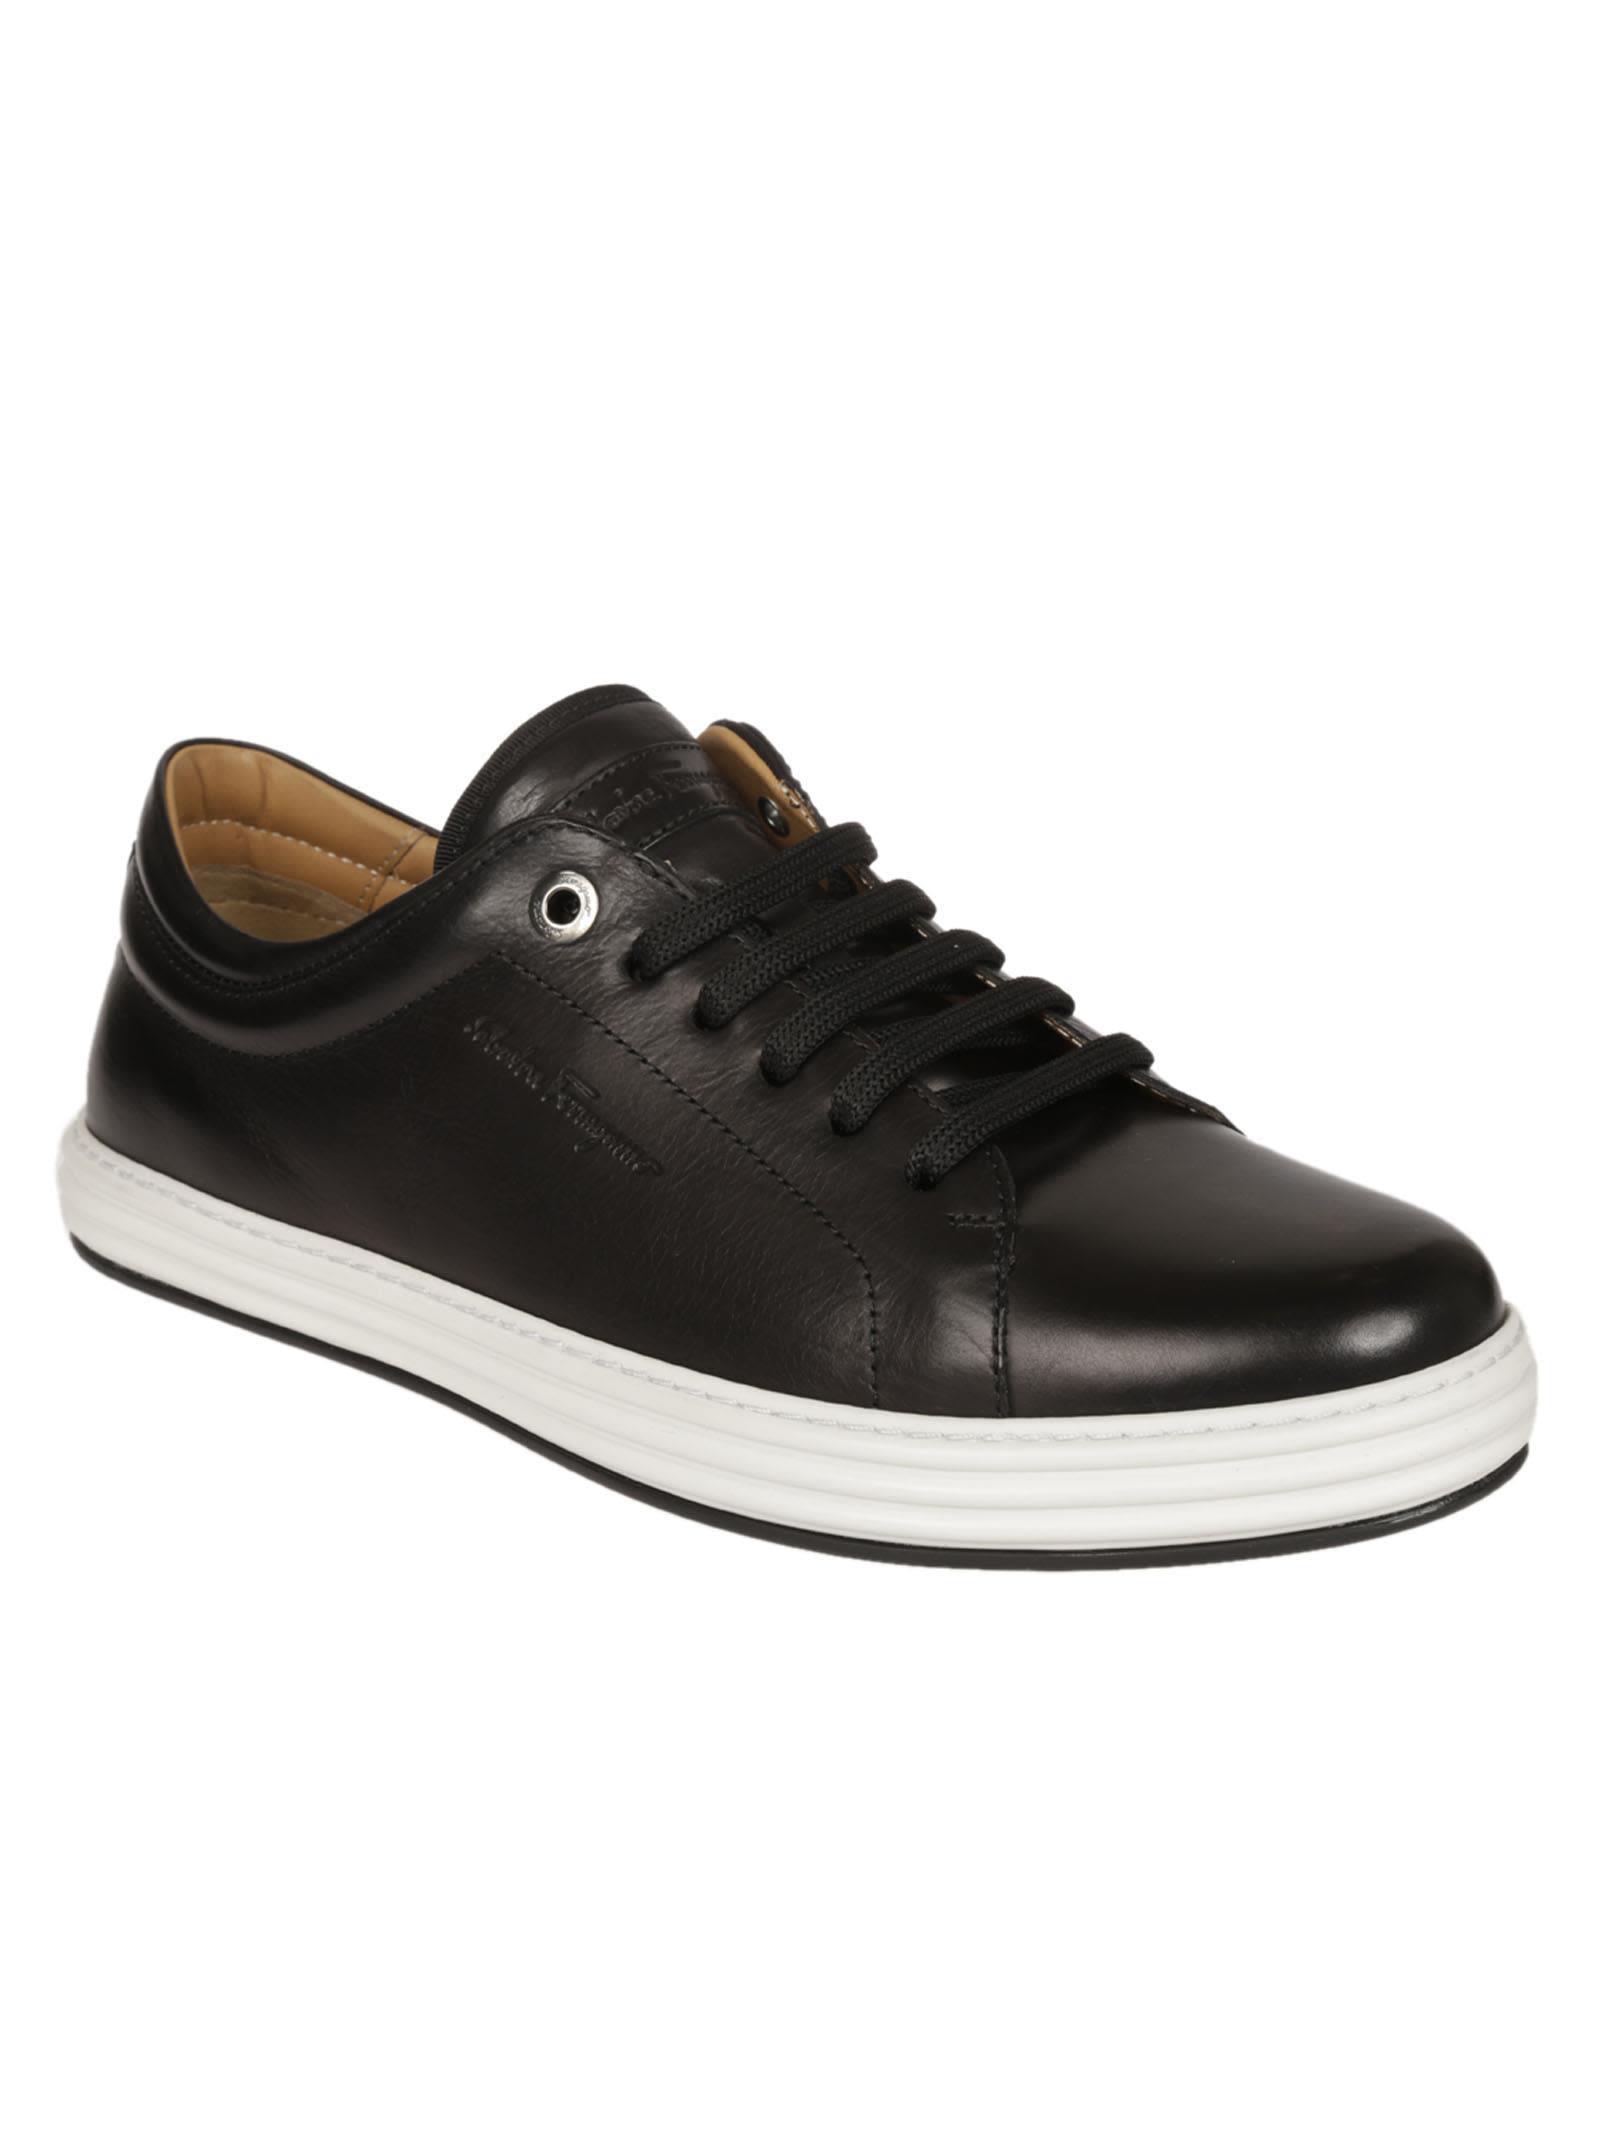 Salvatore Ferragamo Newport Sneakers